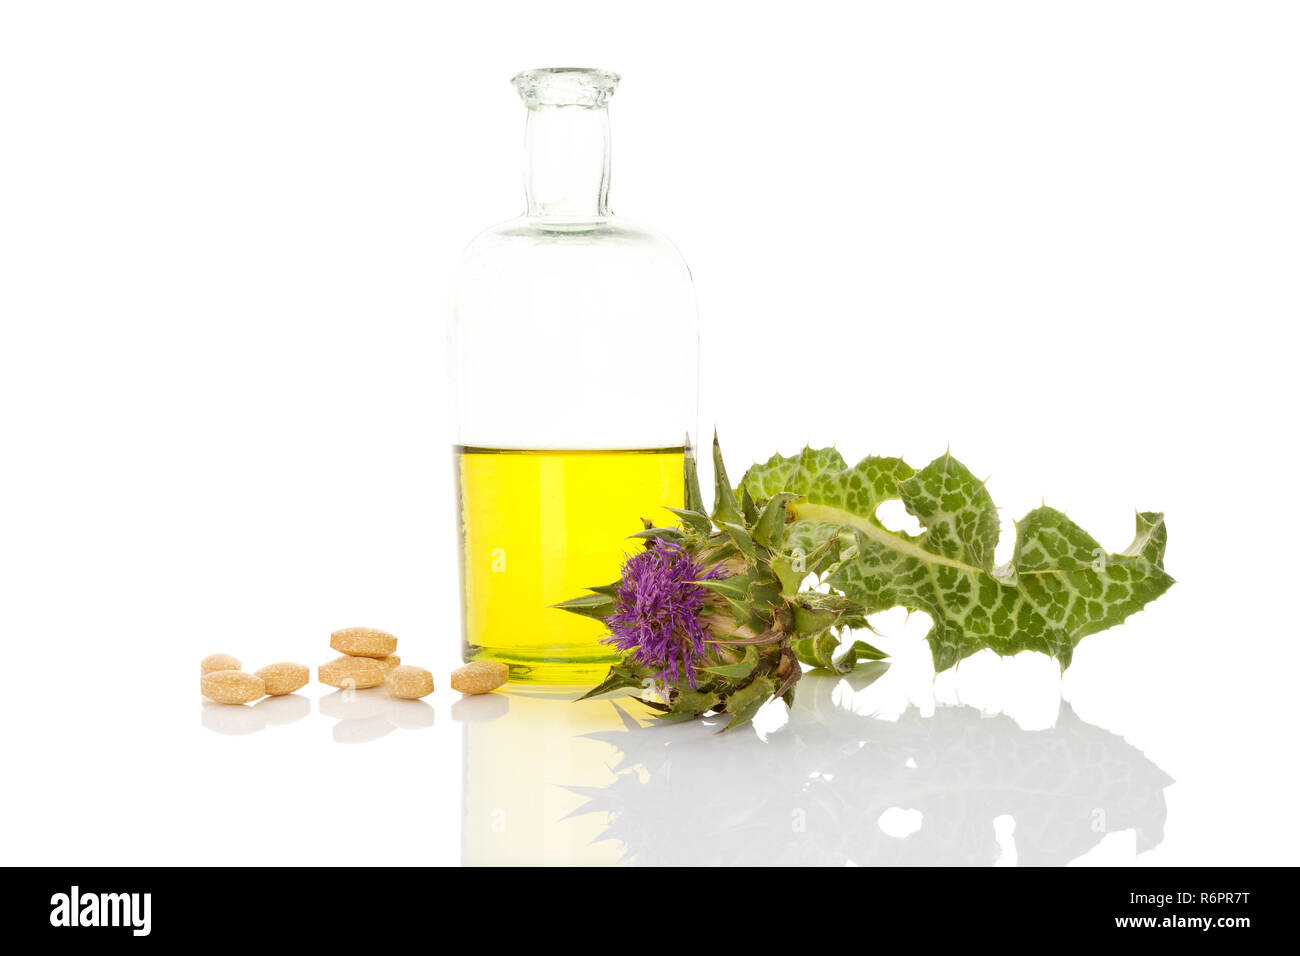 Milk thistle remedy concept. - Stock Image